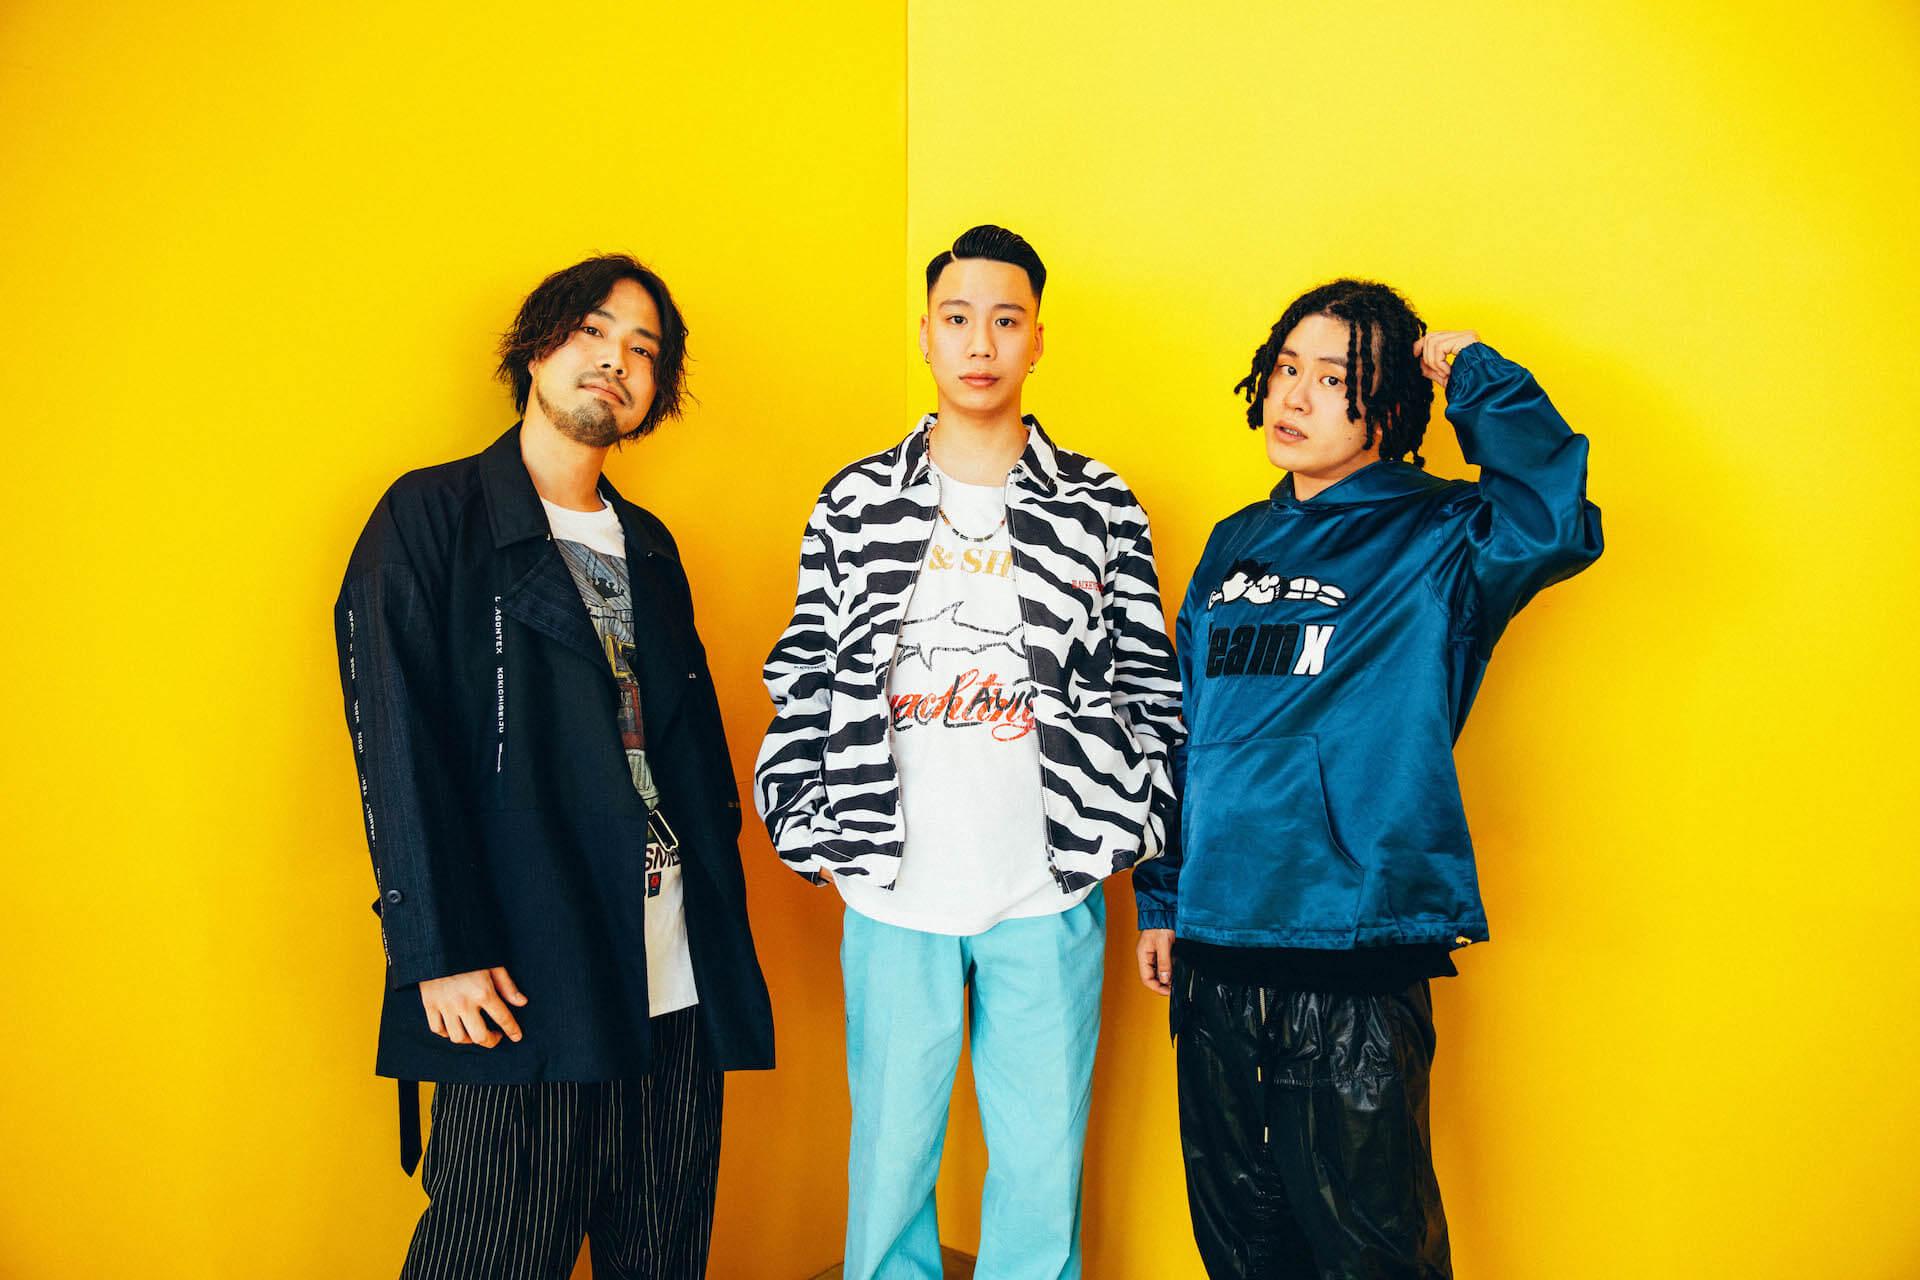 SIRUP、釈迦坊主、Tohji、tofubeats、chelmicoらが出演!<CIRCUS × CIRCUS>が8月に開催決定 music200610_circuscircus_6